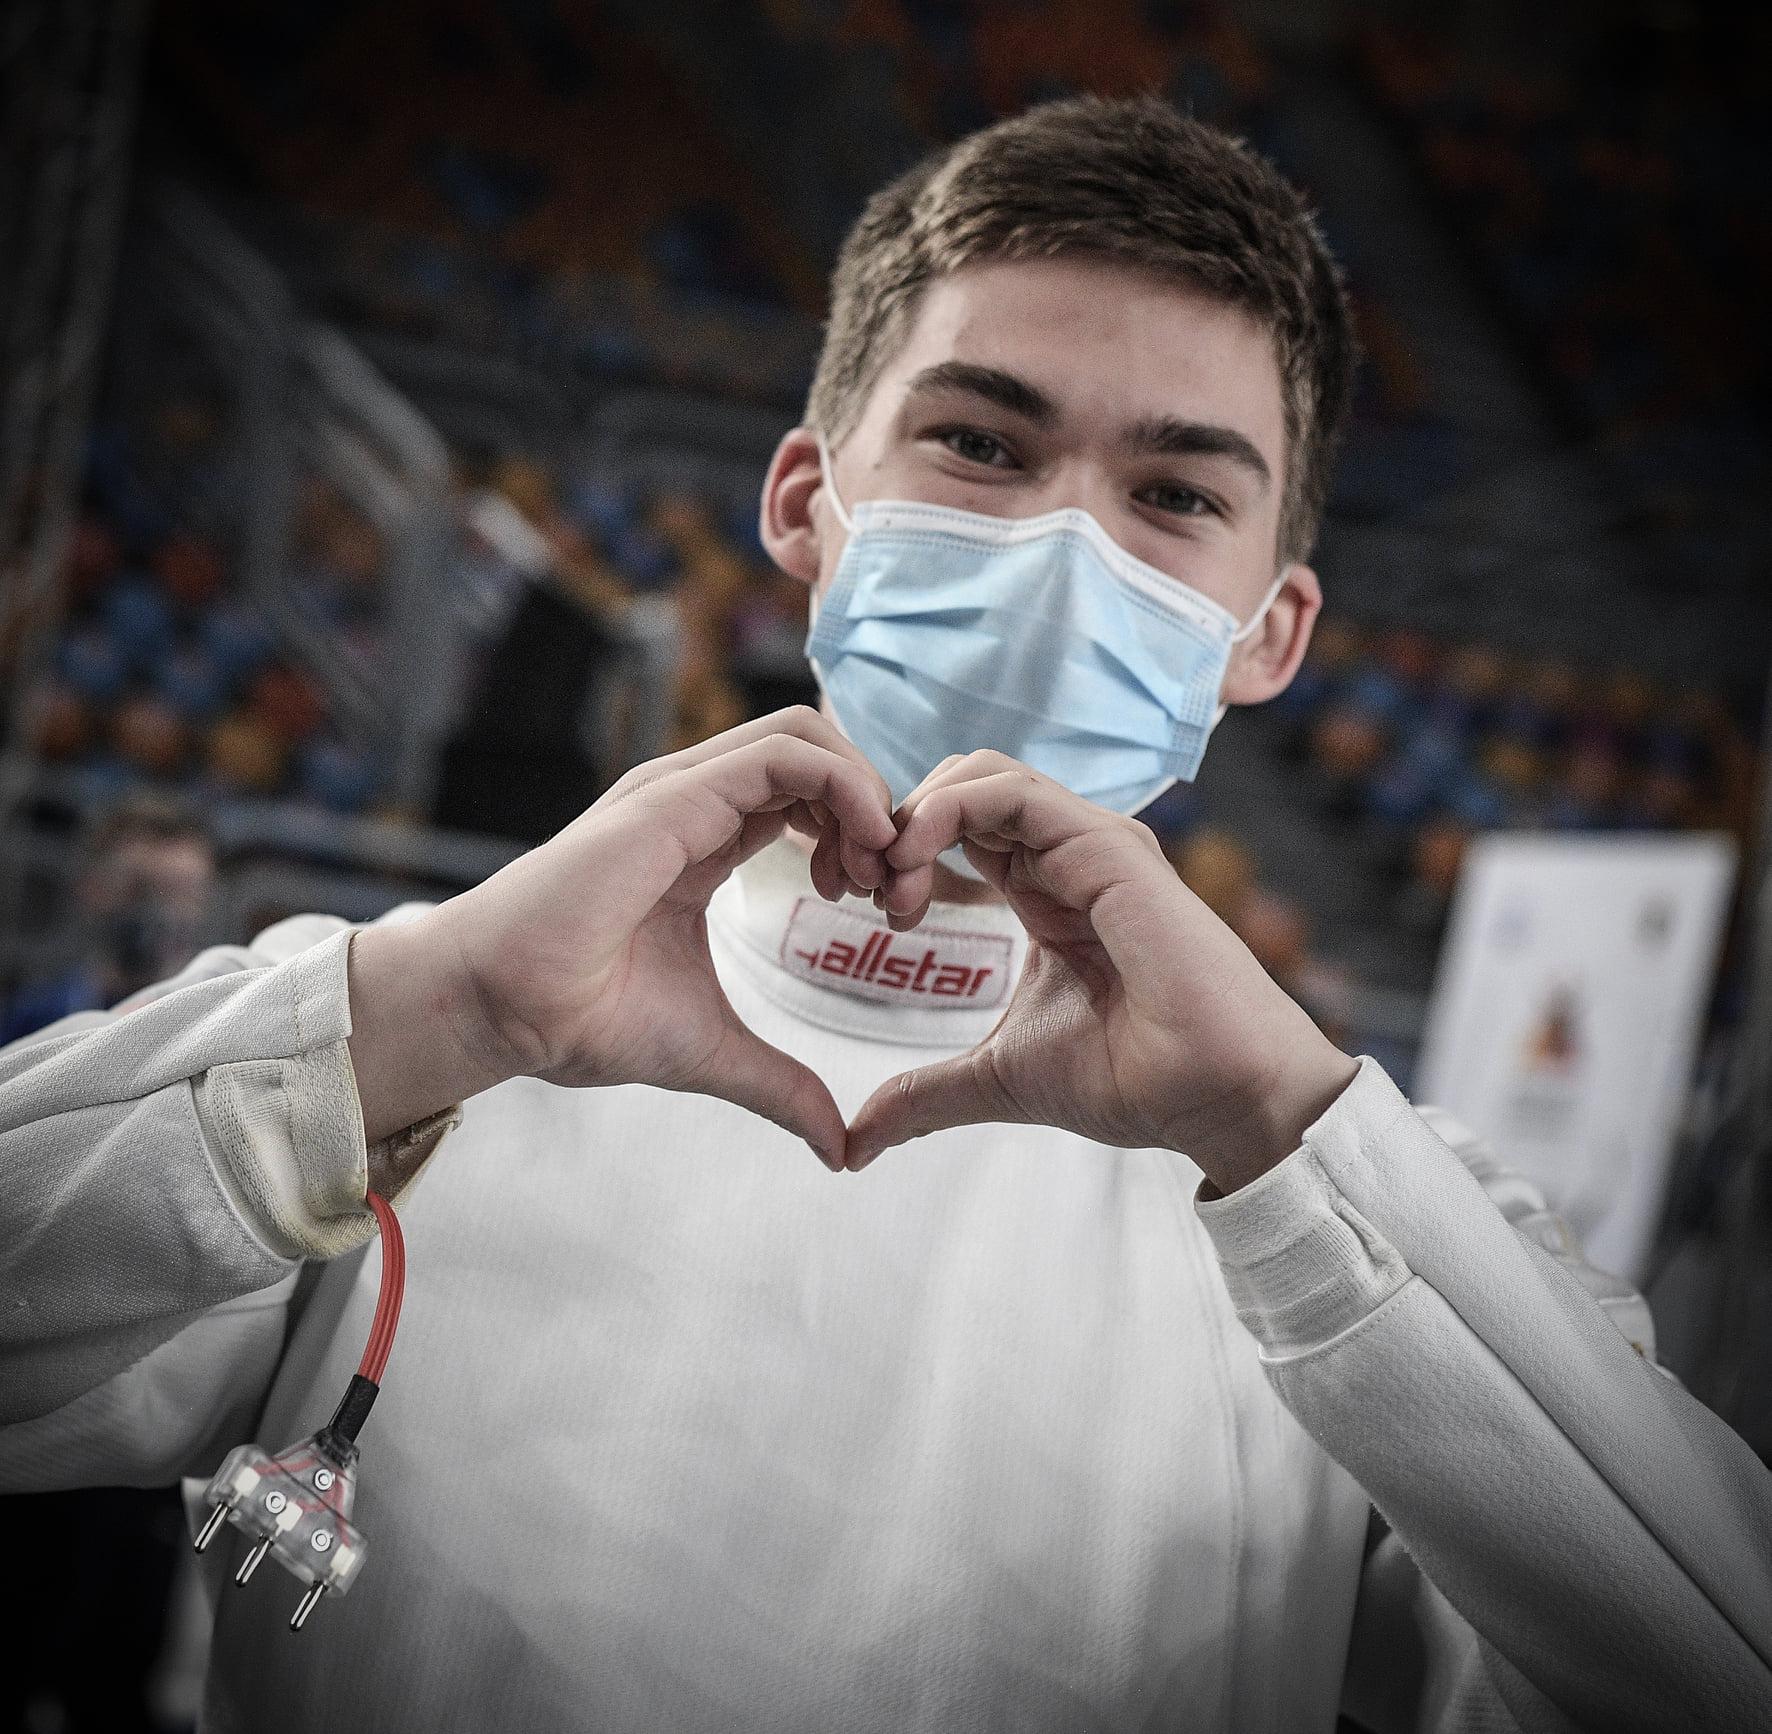 Egor Lomaga Rússia heart celebrates comemora